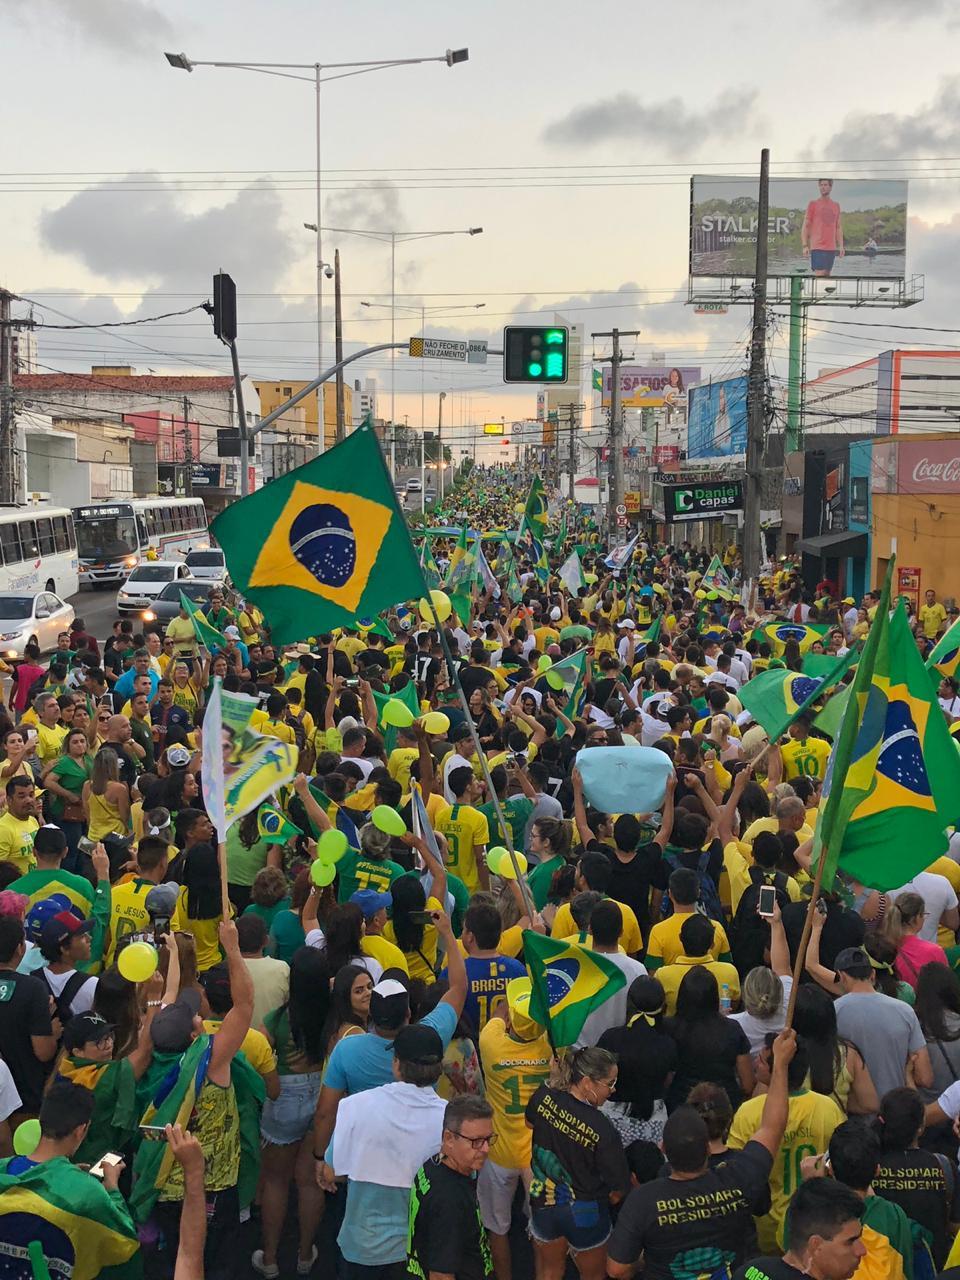 Ato pró-Bolsonaro em Nata l- 21 outubro - Foto Laís Morais (1)